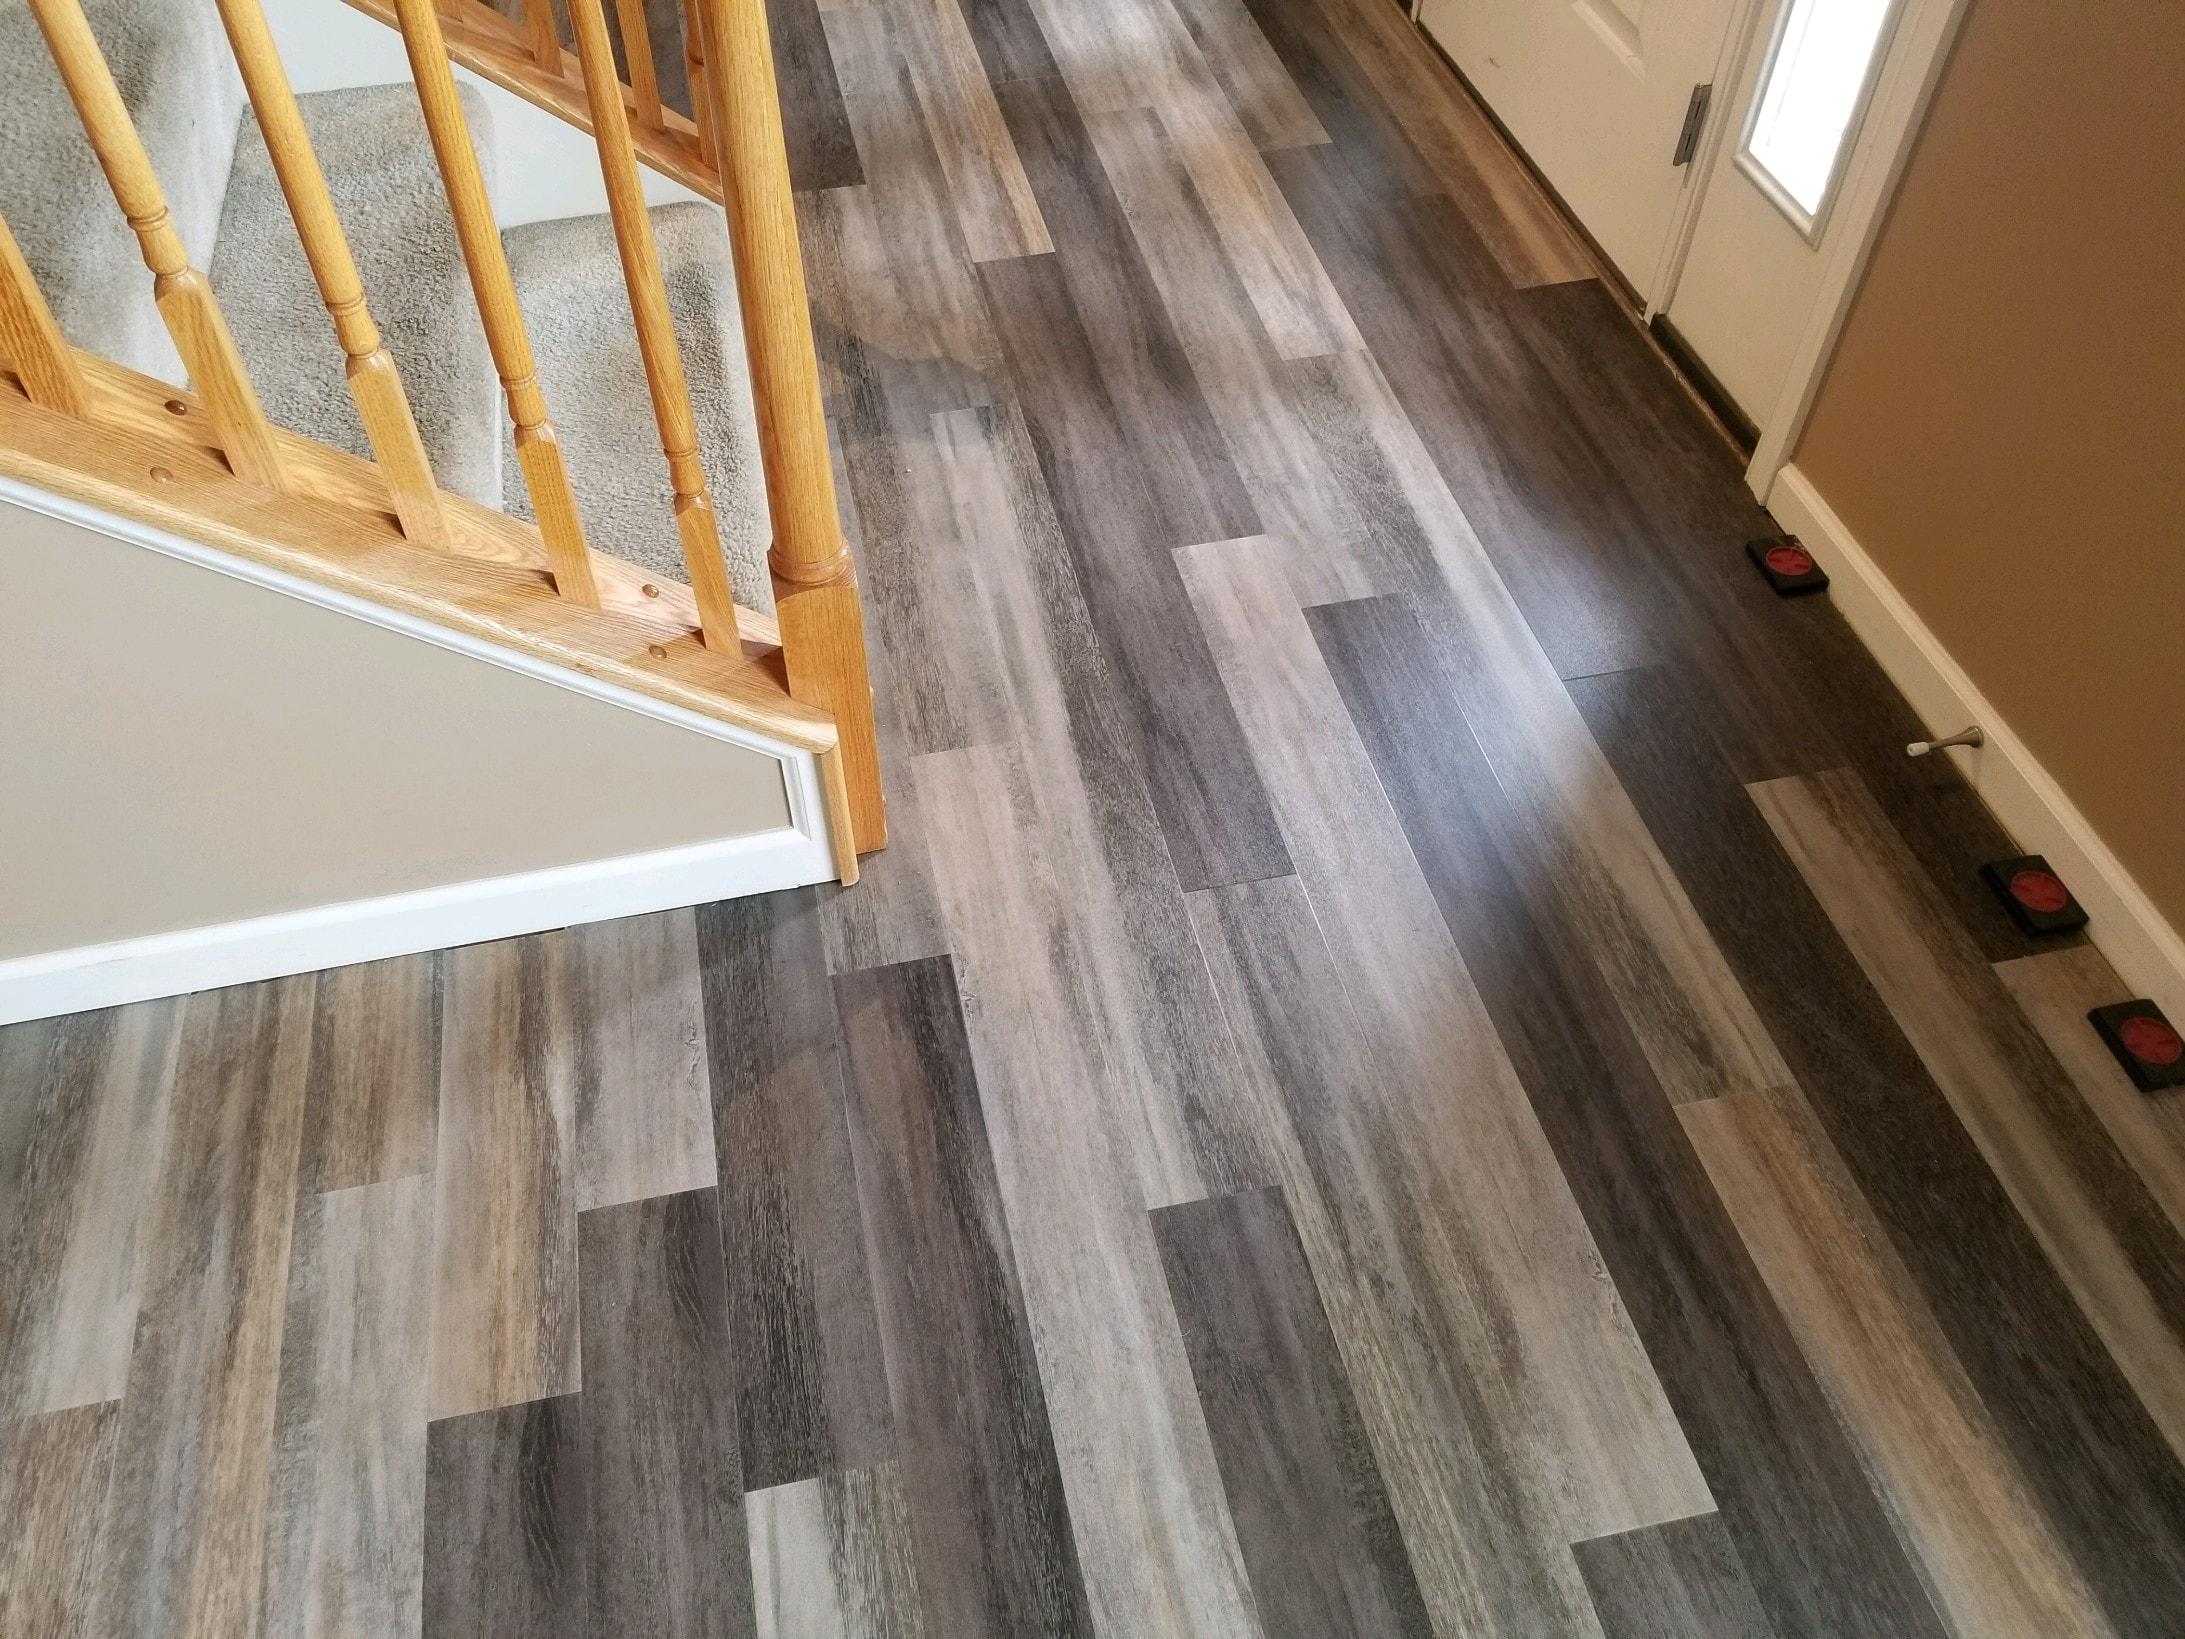 resilient-vinyl-plank-coretec-leola-july-2018-apostle-paul-2-D&S-flooring-min.jpg